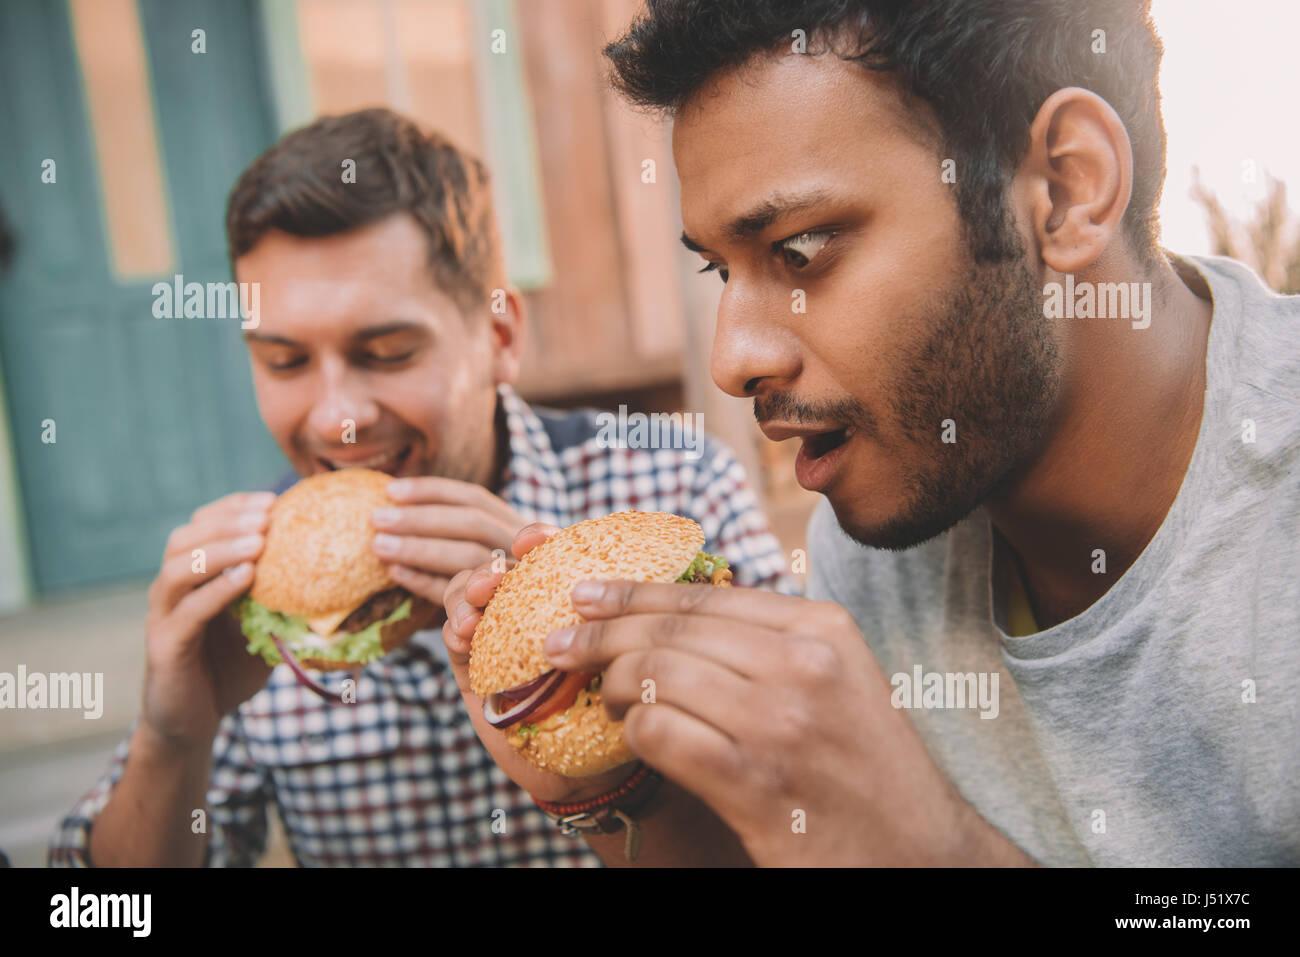 Vista cercana de hombres jóvenes emocional comiendo hamburguesas gourmet al aire libre Imagen De Stock